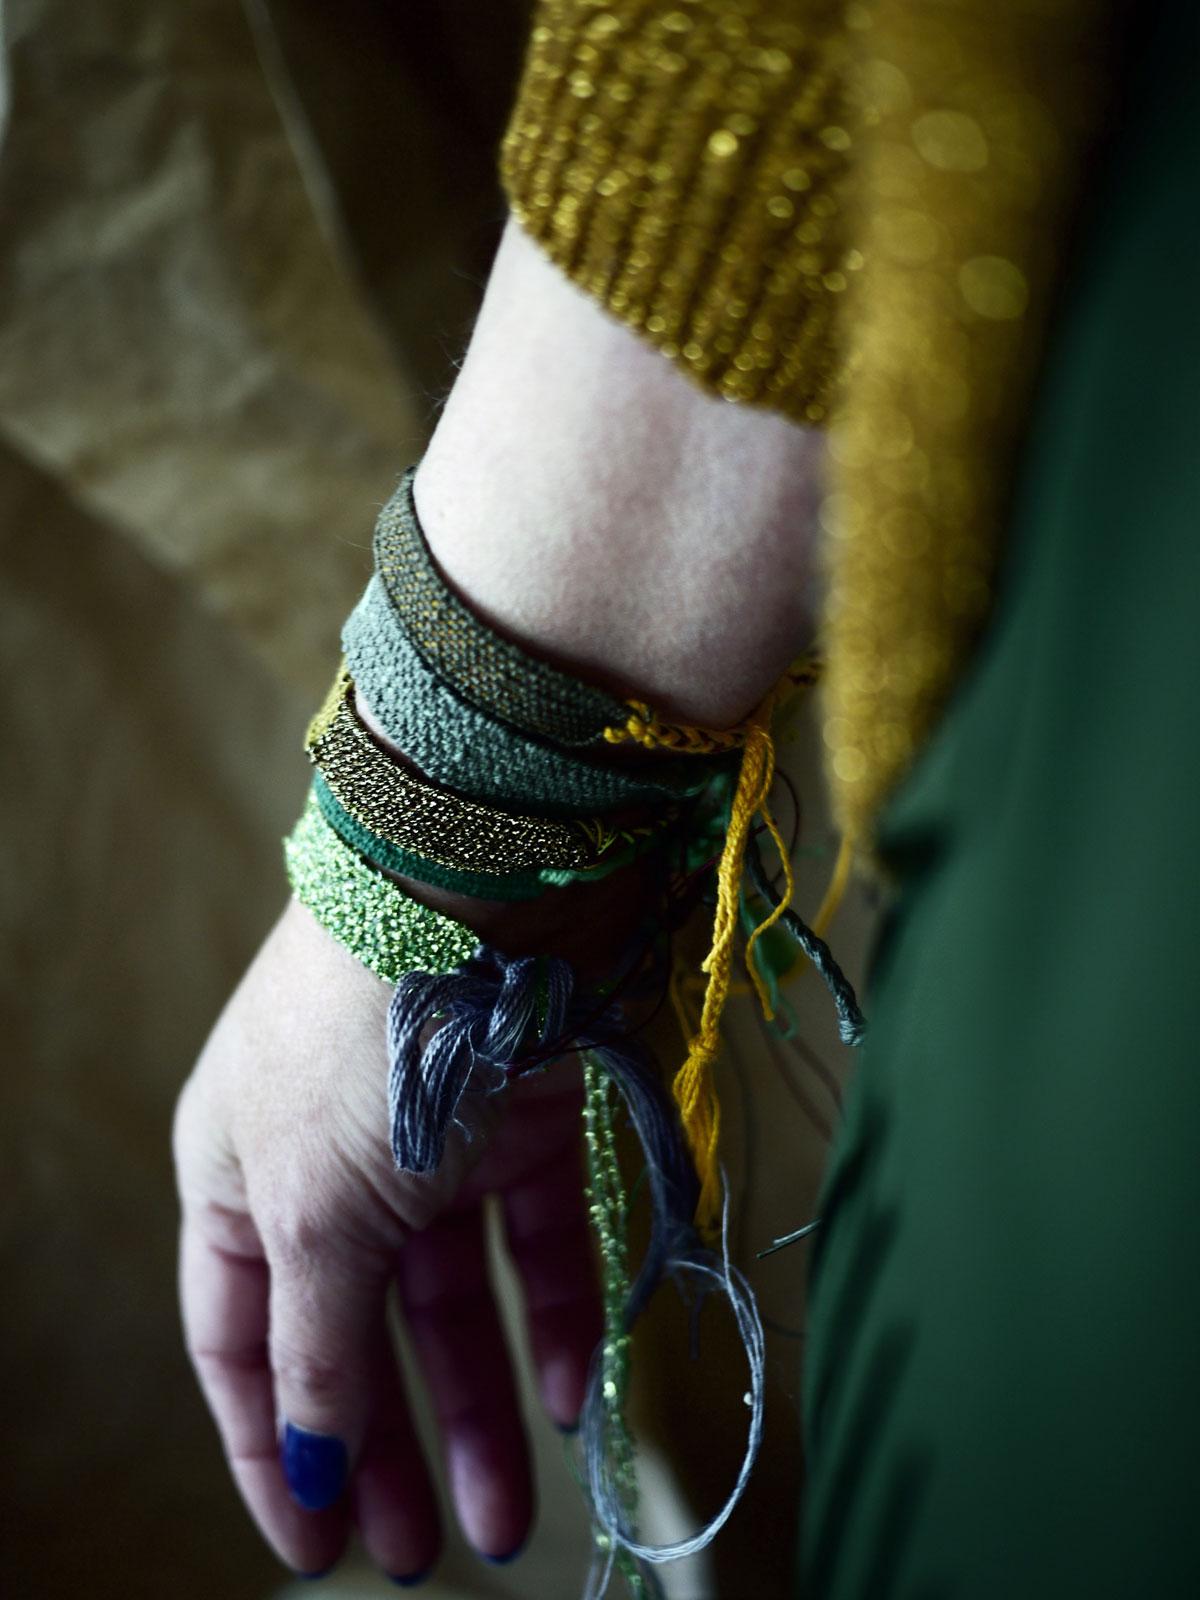 Bracelets LOOM - Design textile by Myriam Balaÿ myriam-balay-bracelet-loom1 GOLD/GREY/GREEN L'appartement